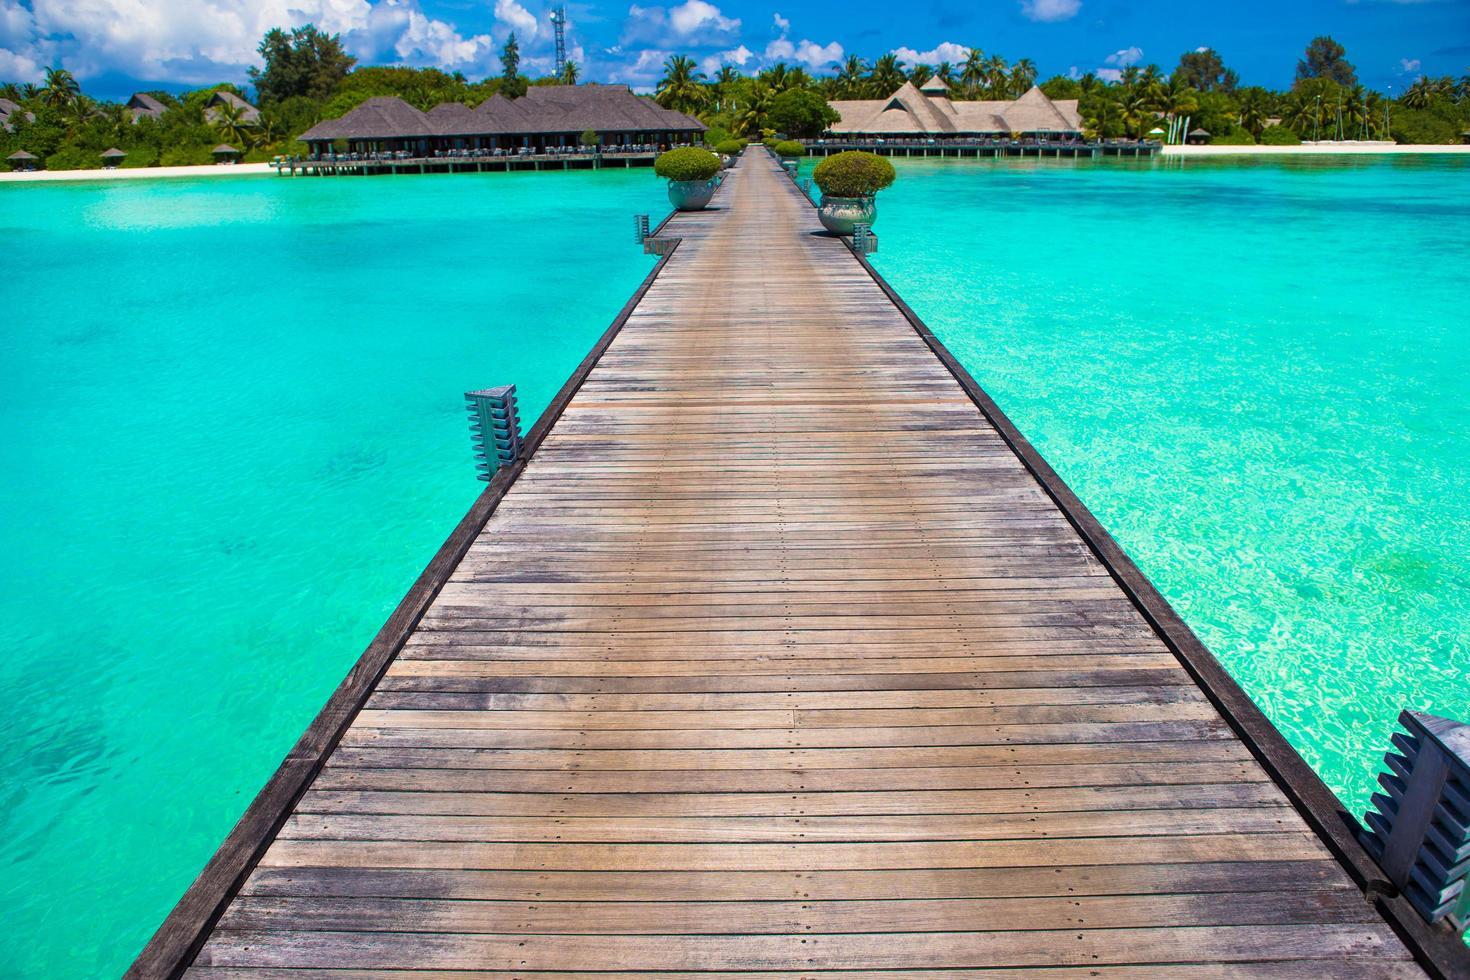 Malediven, Südasien, 2020 - leeres Dock in einem tropischen Resort foto